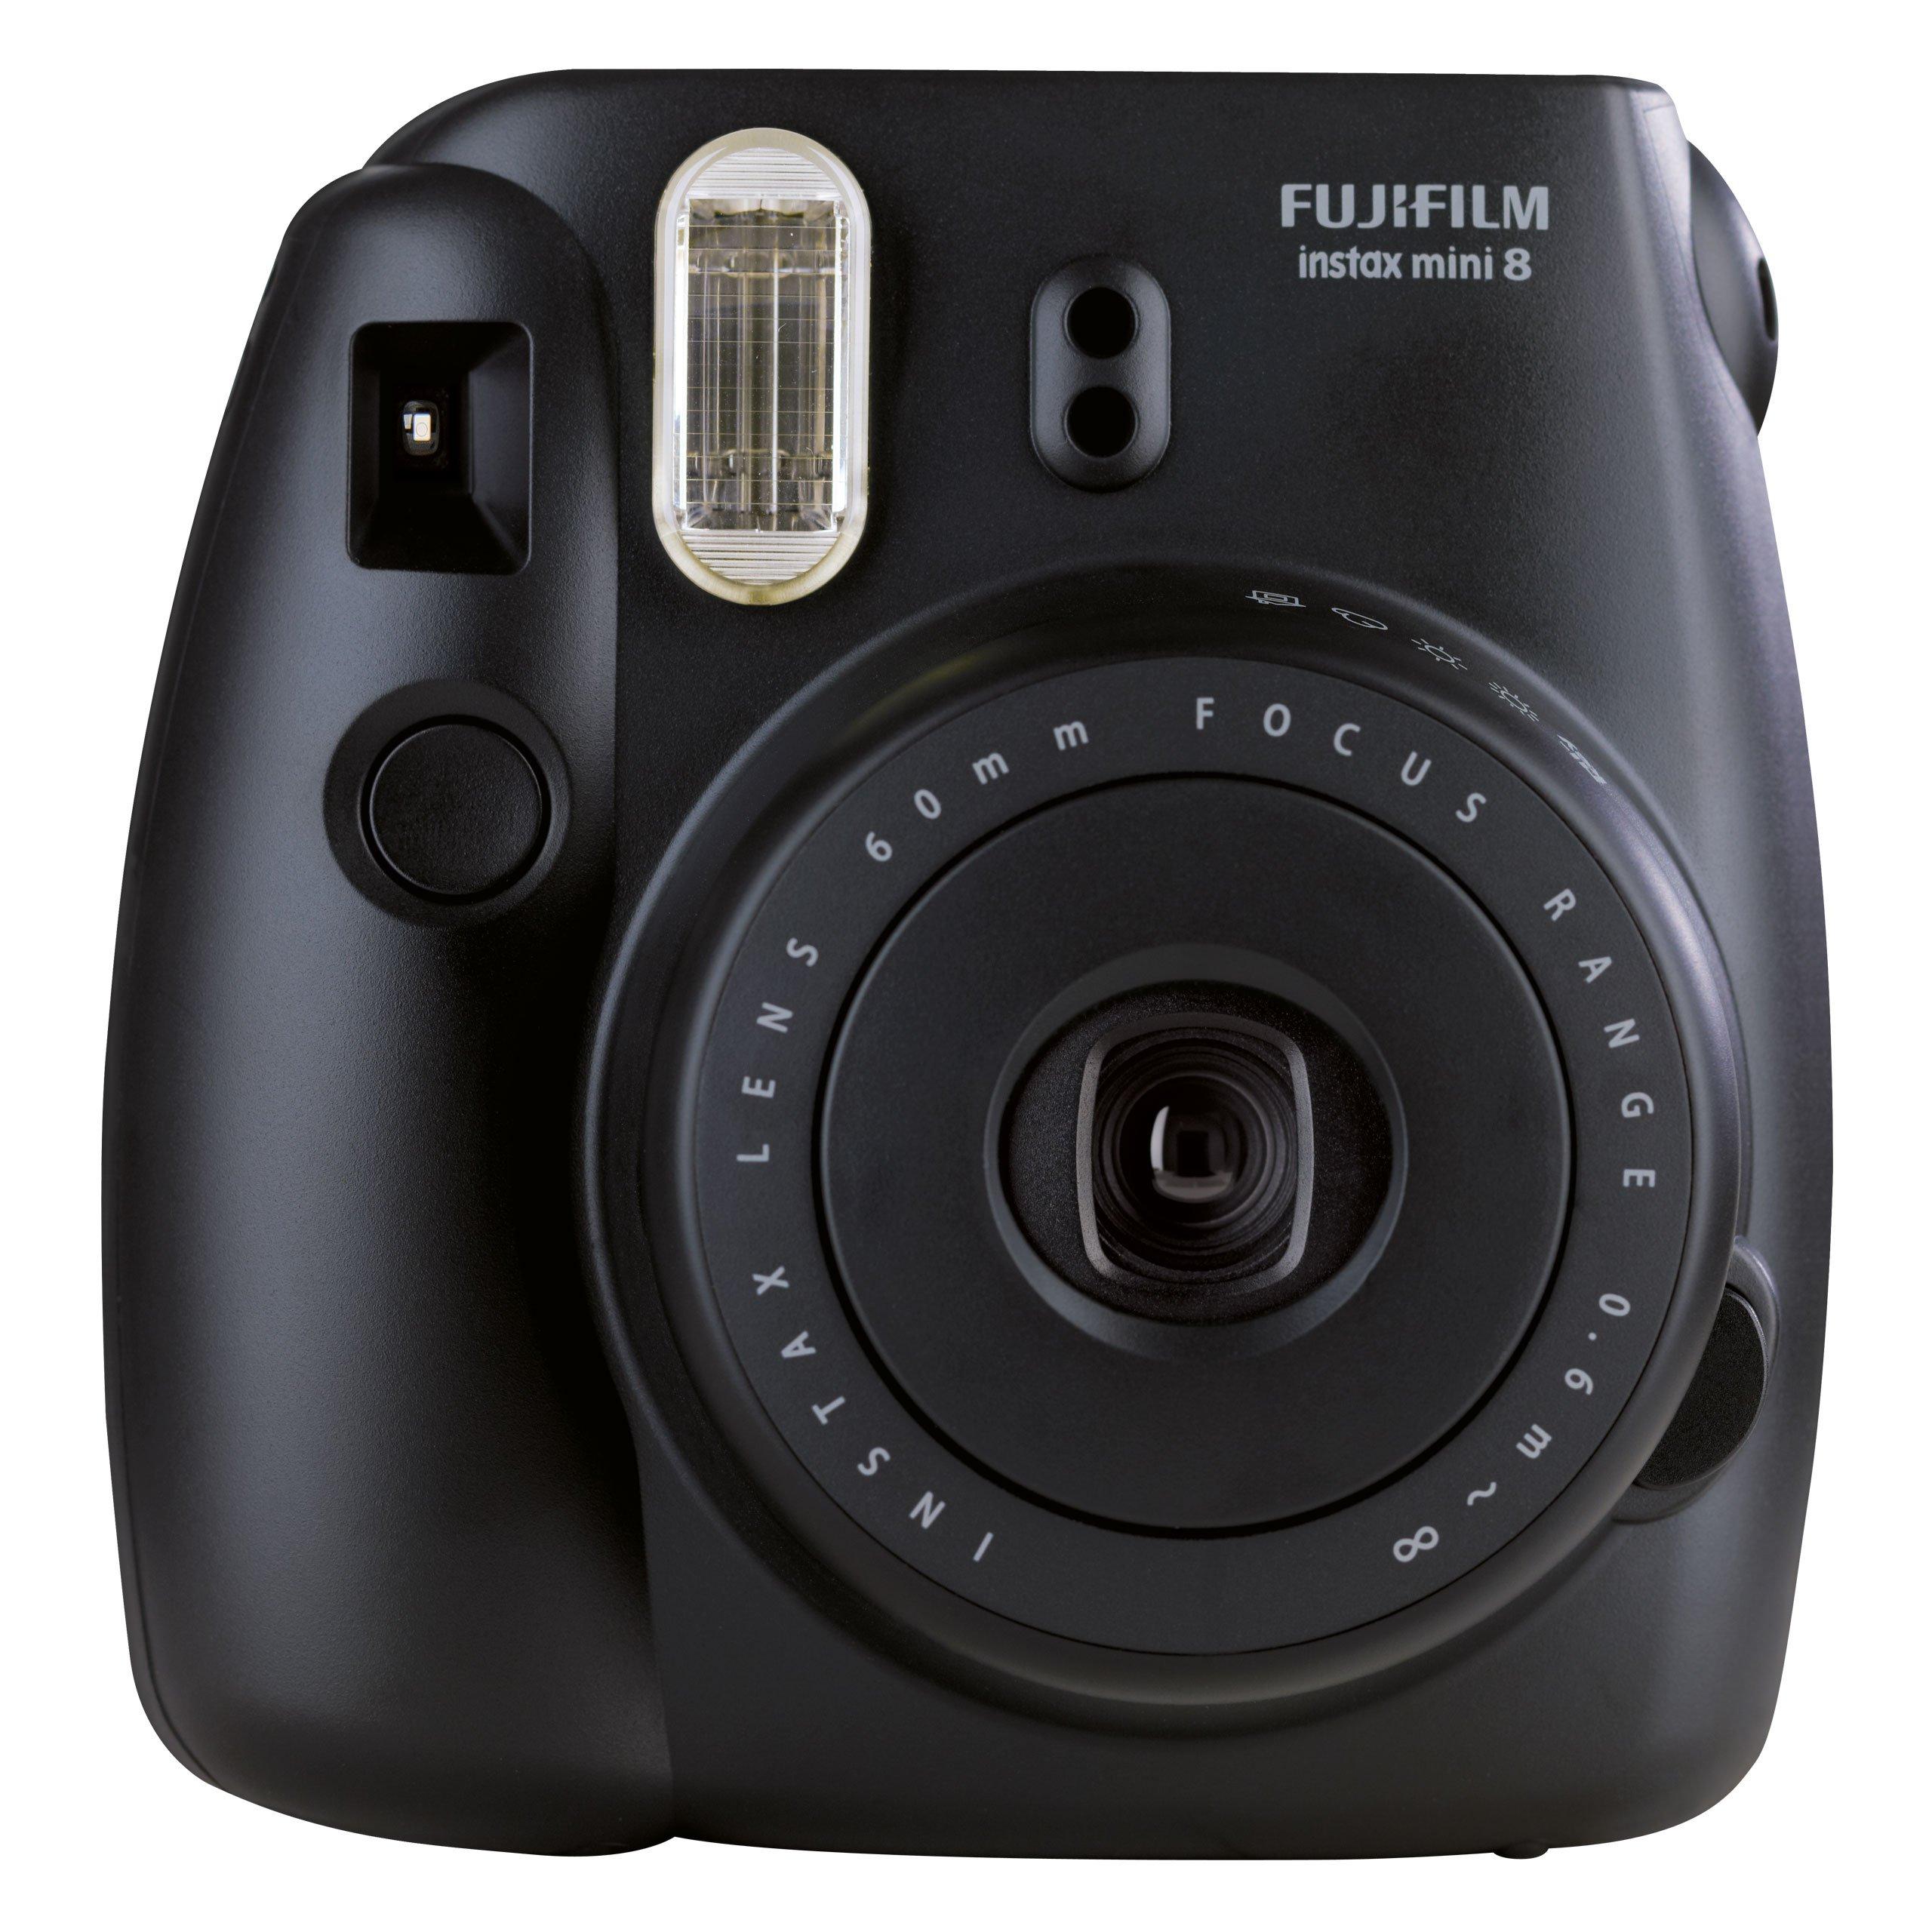 Fujifilm Instax Mini 8 Schwarz Instant Film Compact Camera Built-In Flash